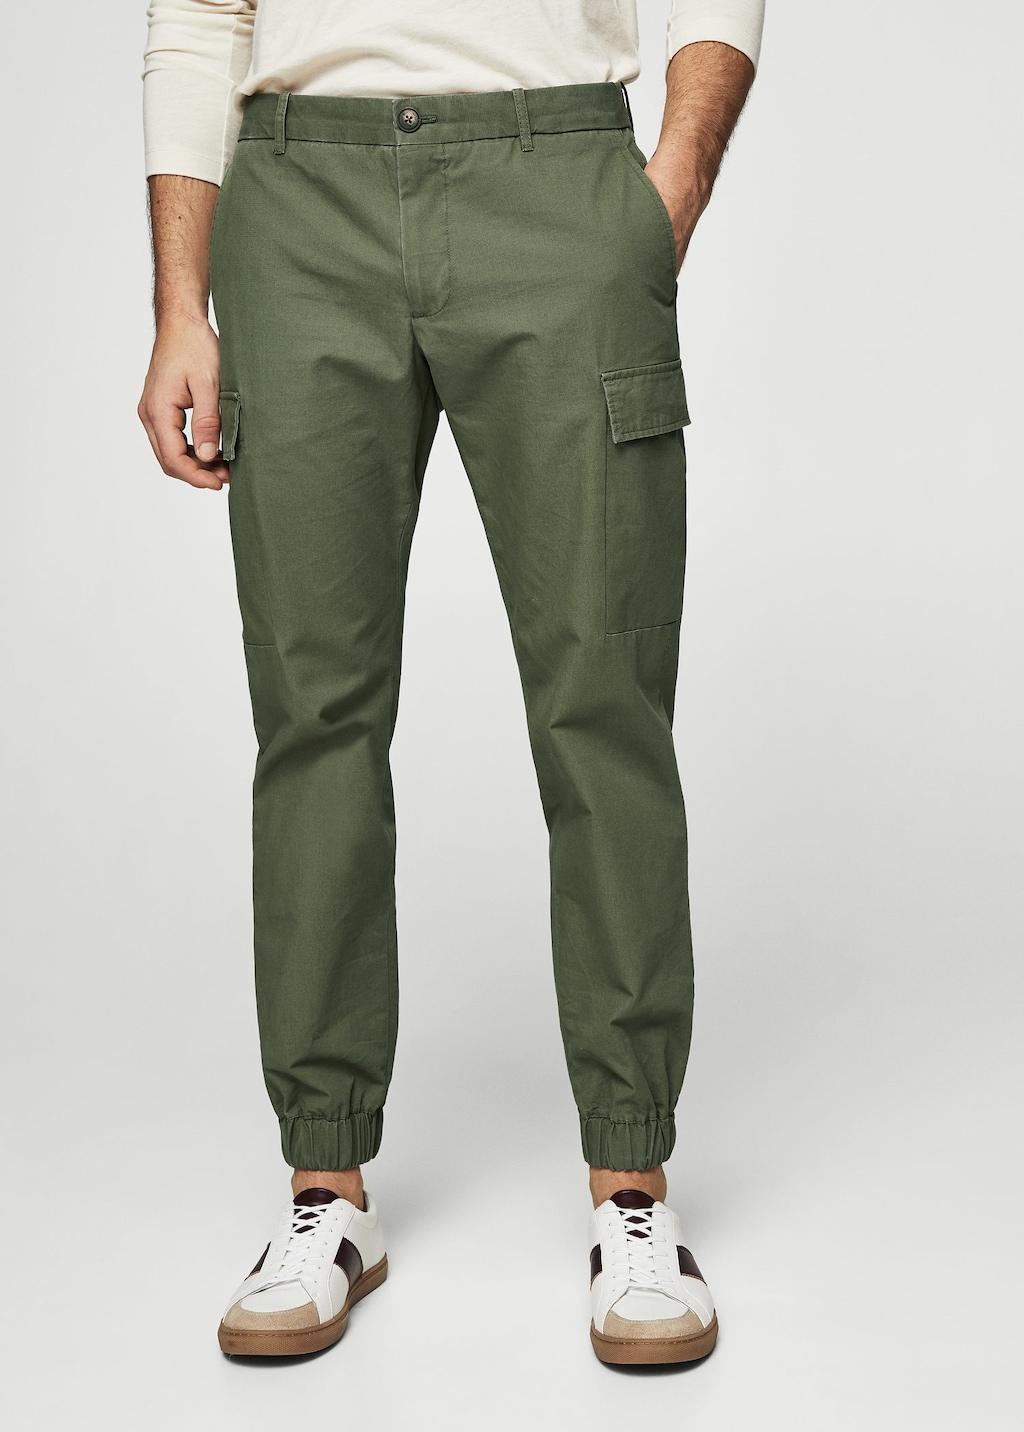 tipos de pantalones para hombre madmenmag